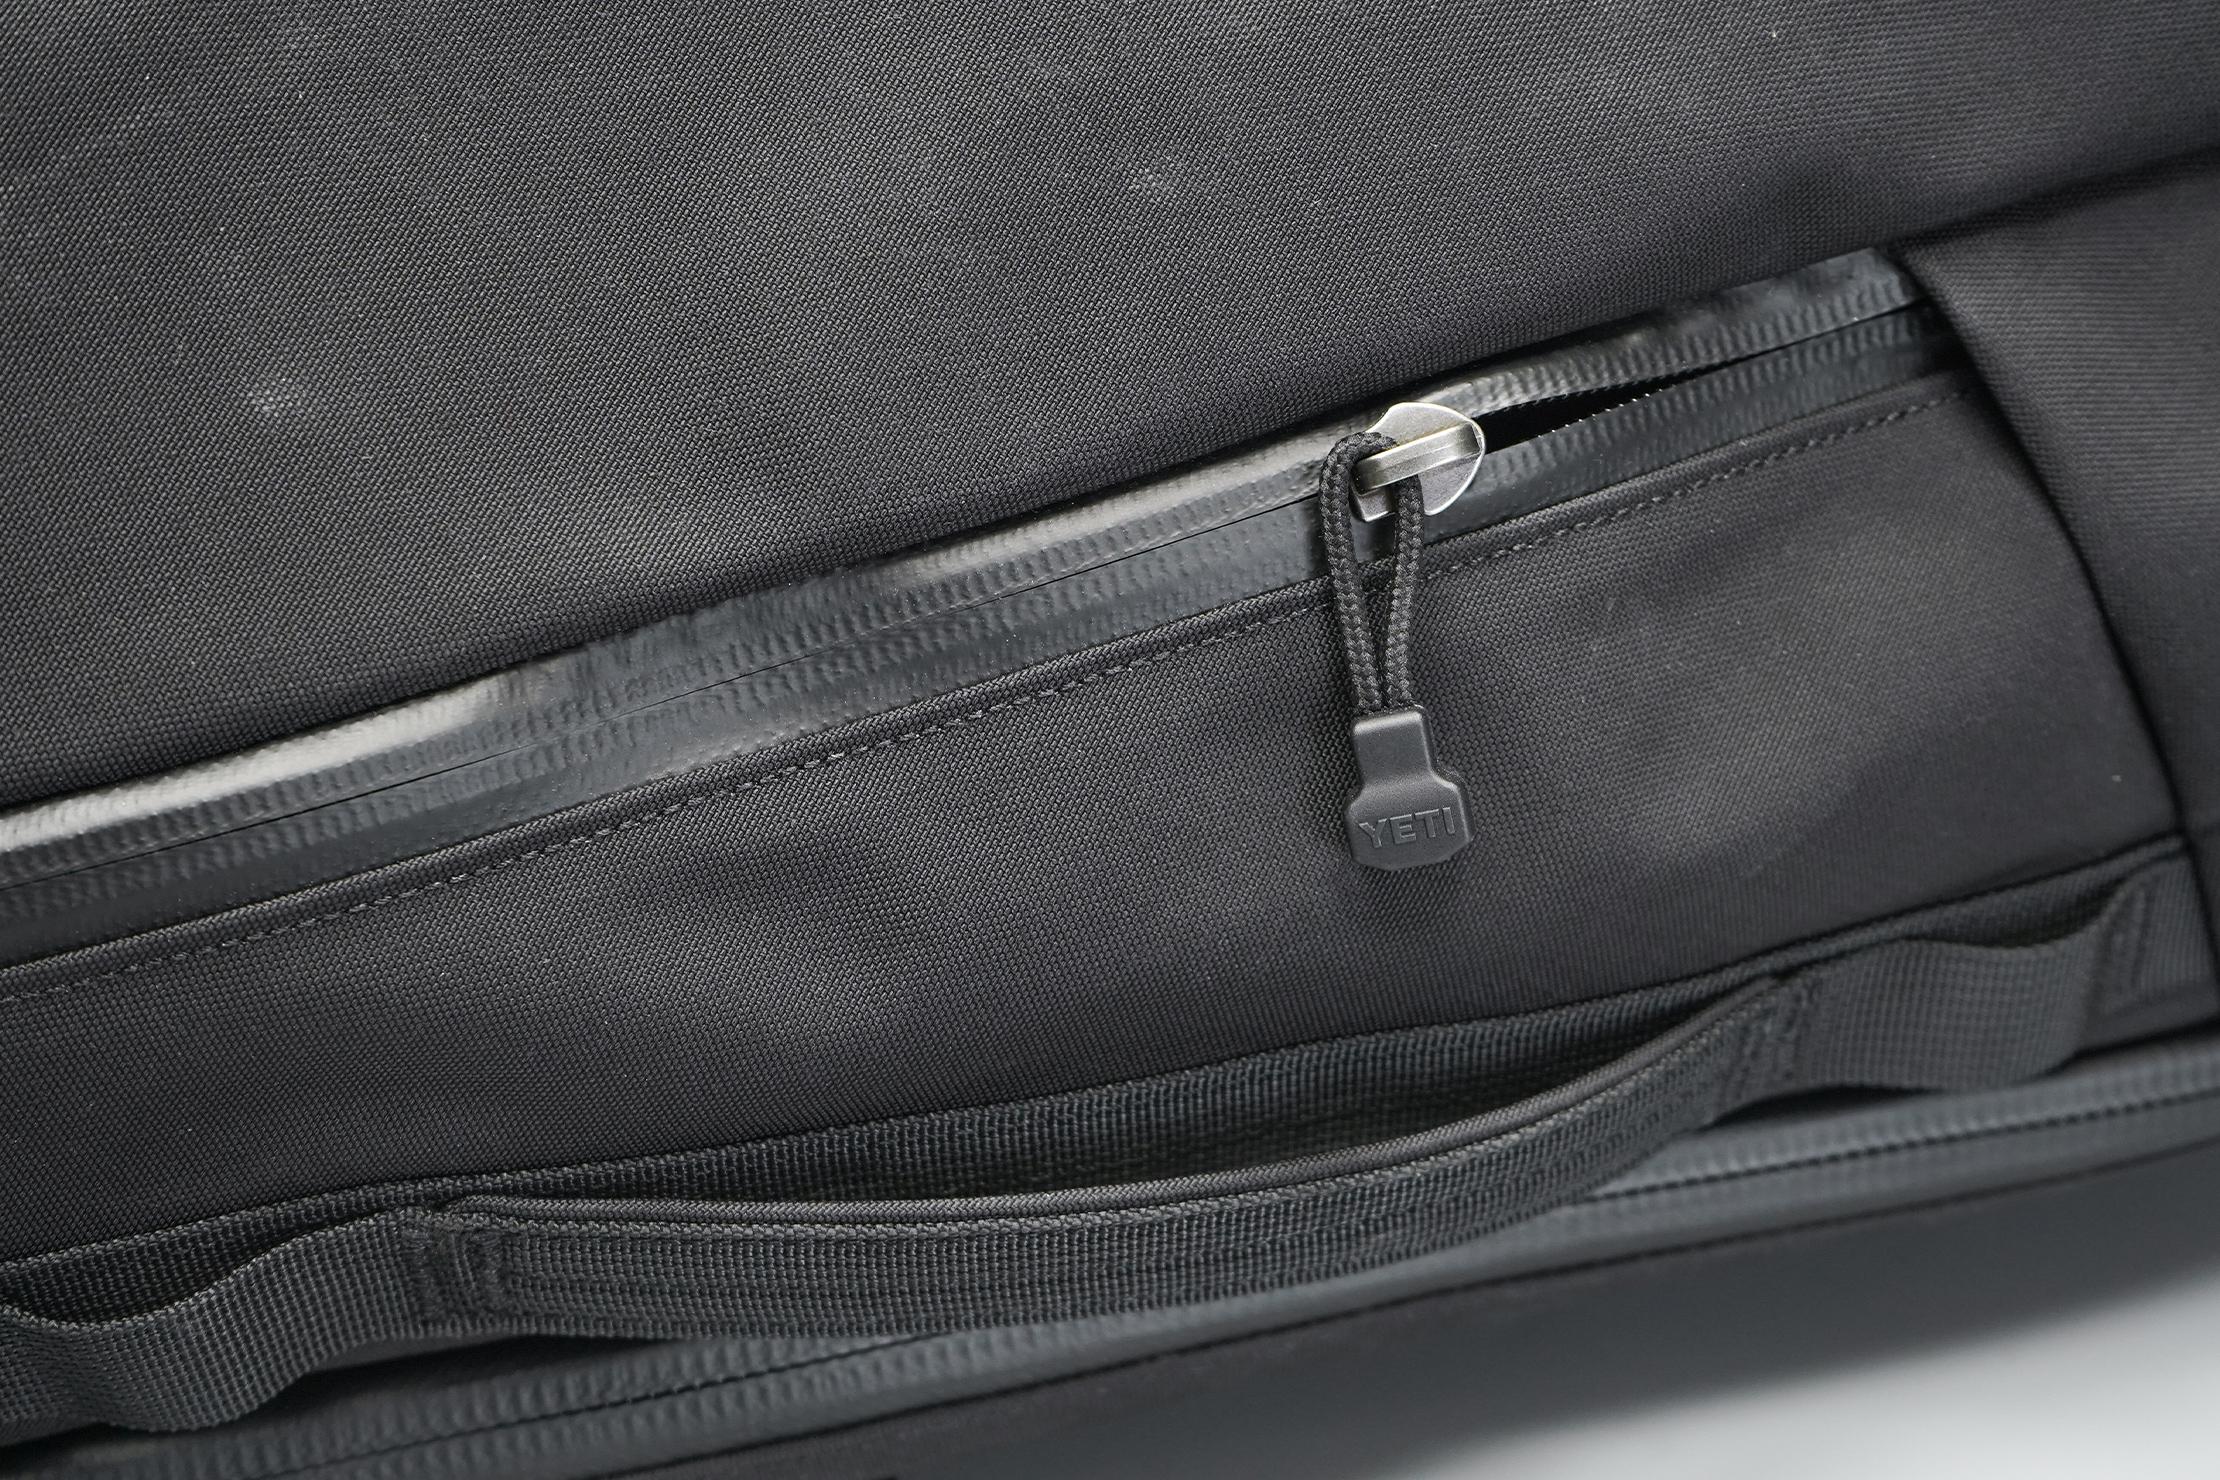 YETI Crossroads 35L Backpack | The TuffSkin Nylon and YKK zipper.